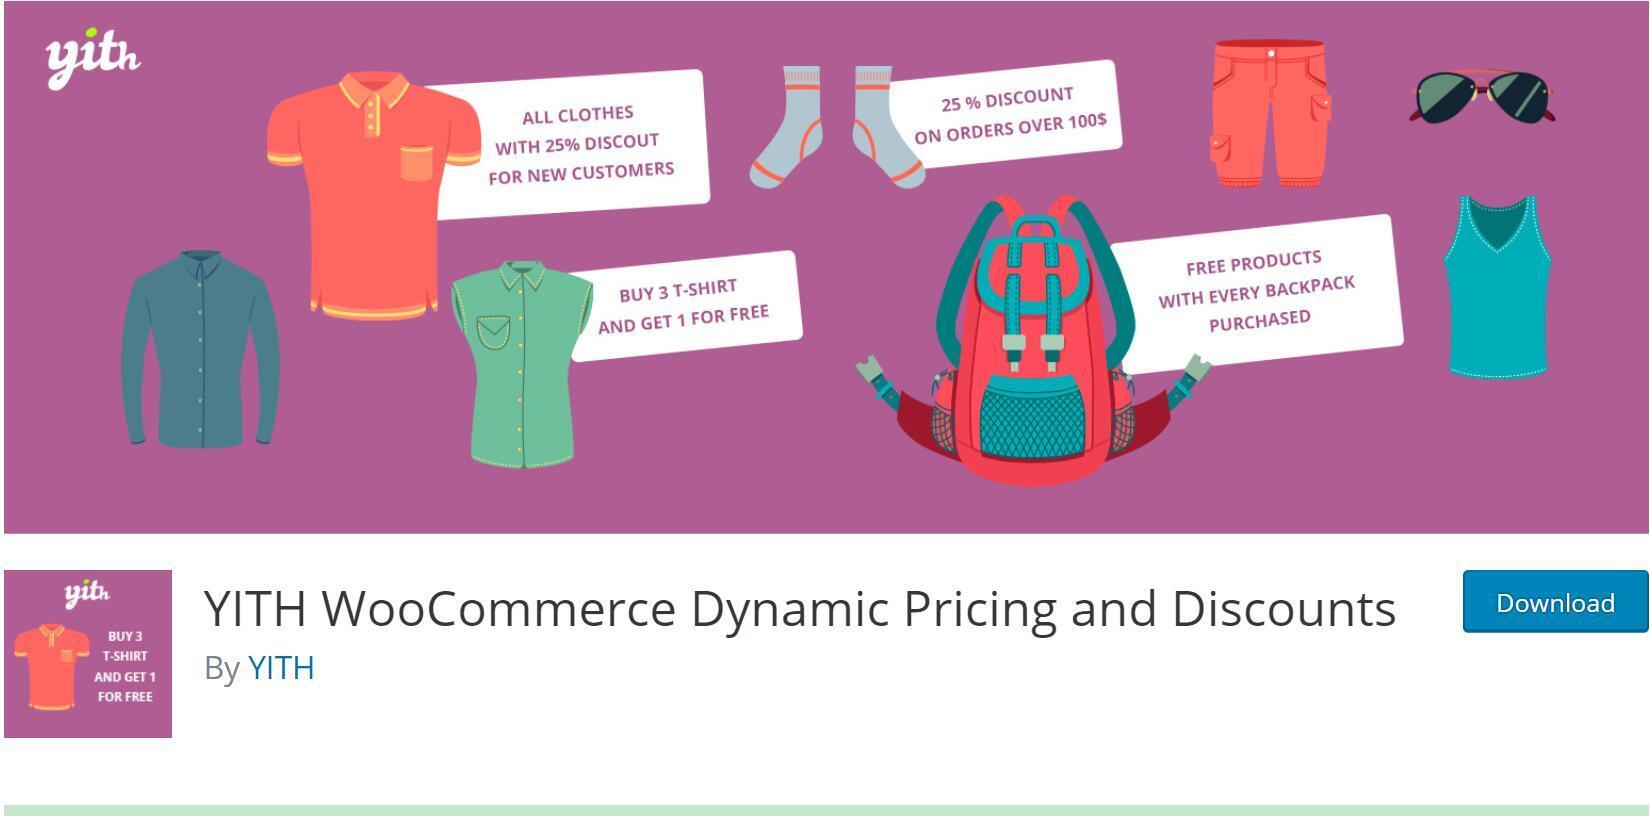 wp电商动态定价和折扣高级版YITH WooCommerce Dynamic Pricing and Discounts Premium v1.6.5